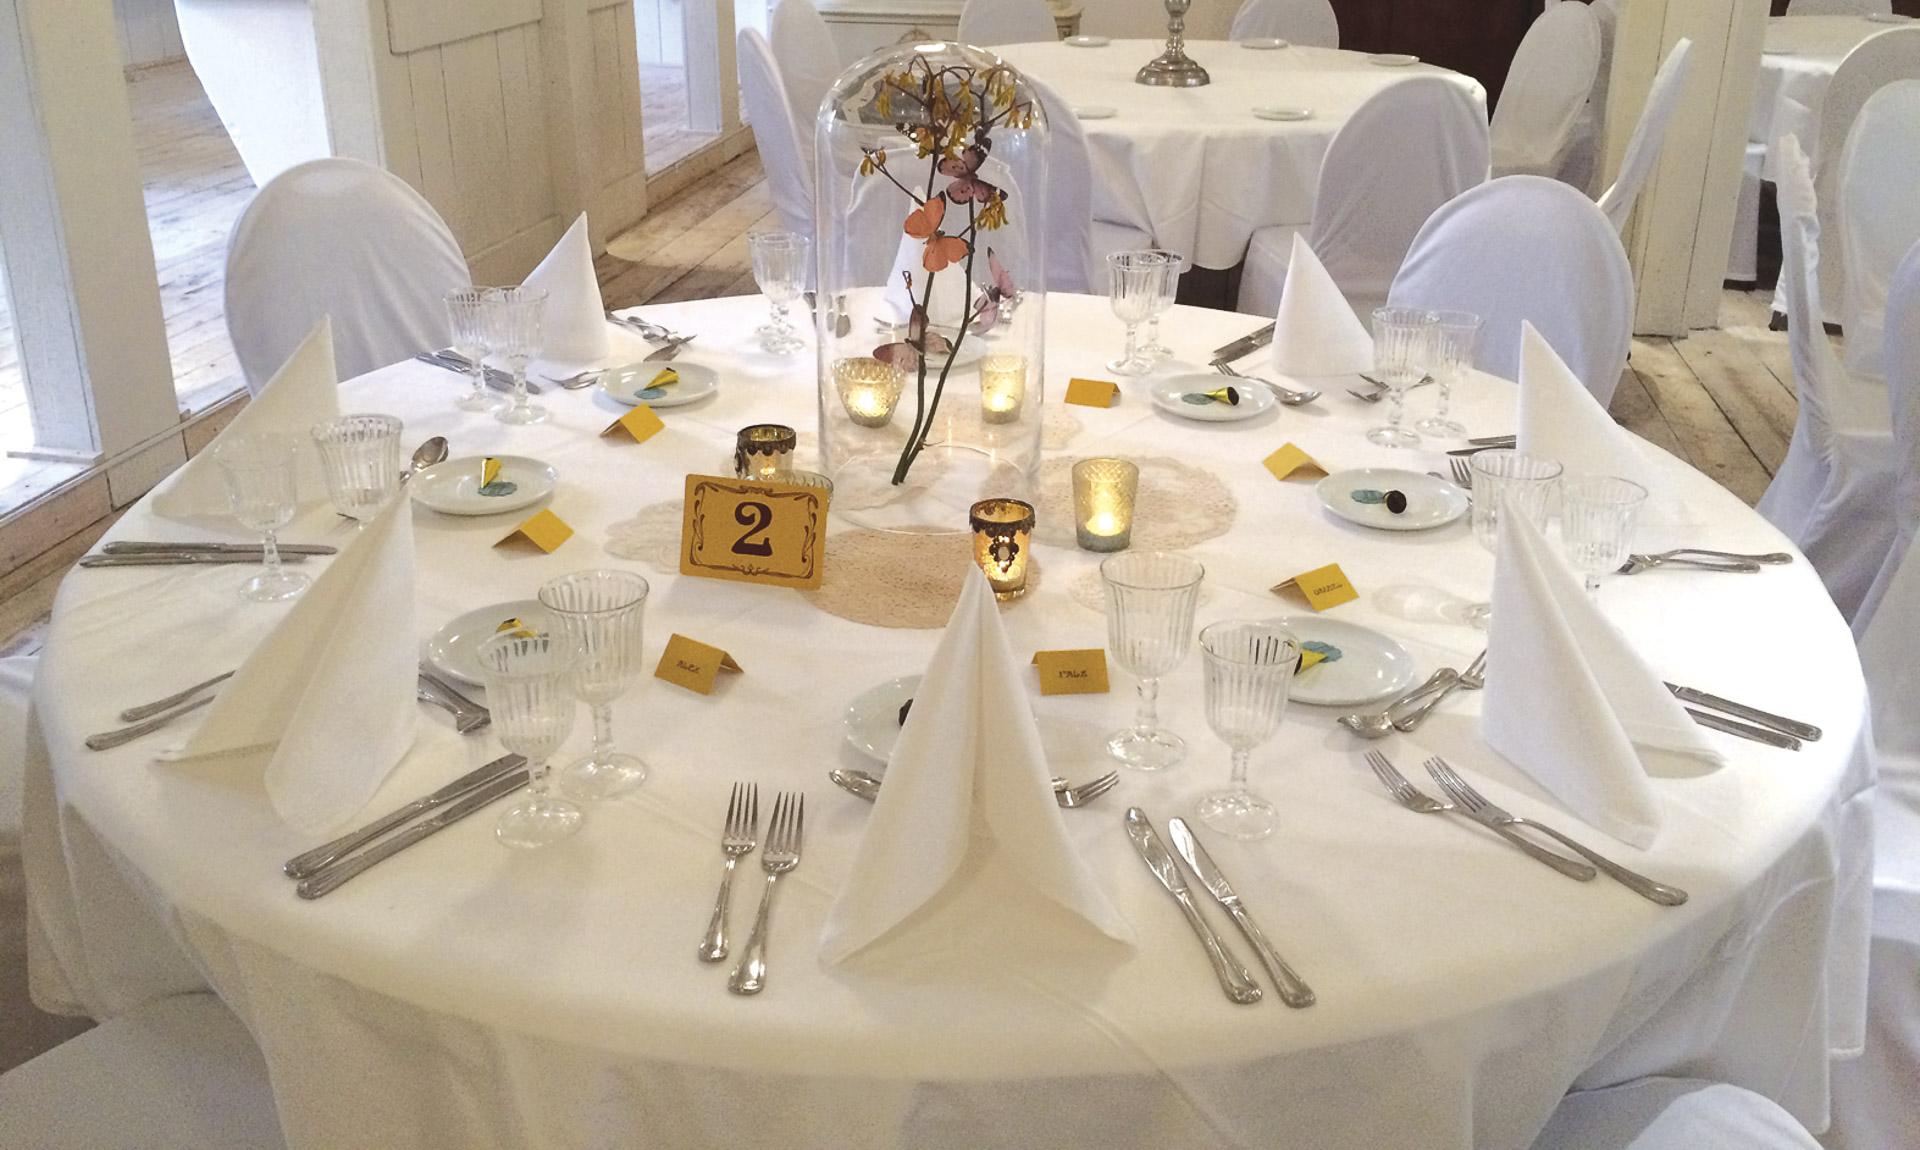 nassimshams autumnfairytale 6 the wedding table. Black Bedroom Furniture Sets. Home Design Ideas